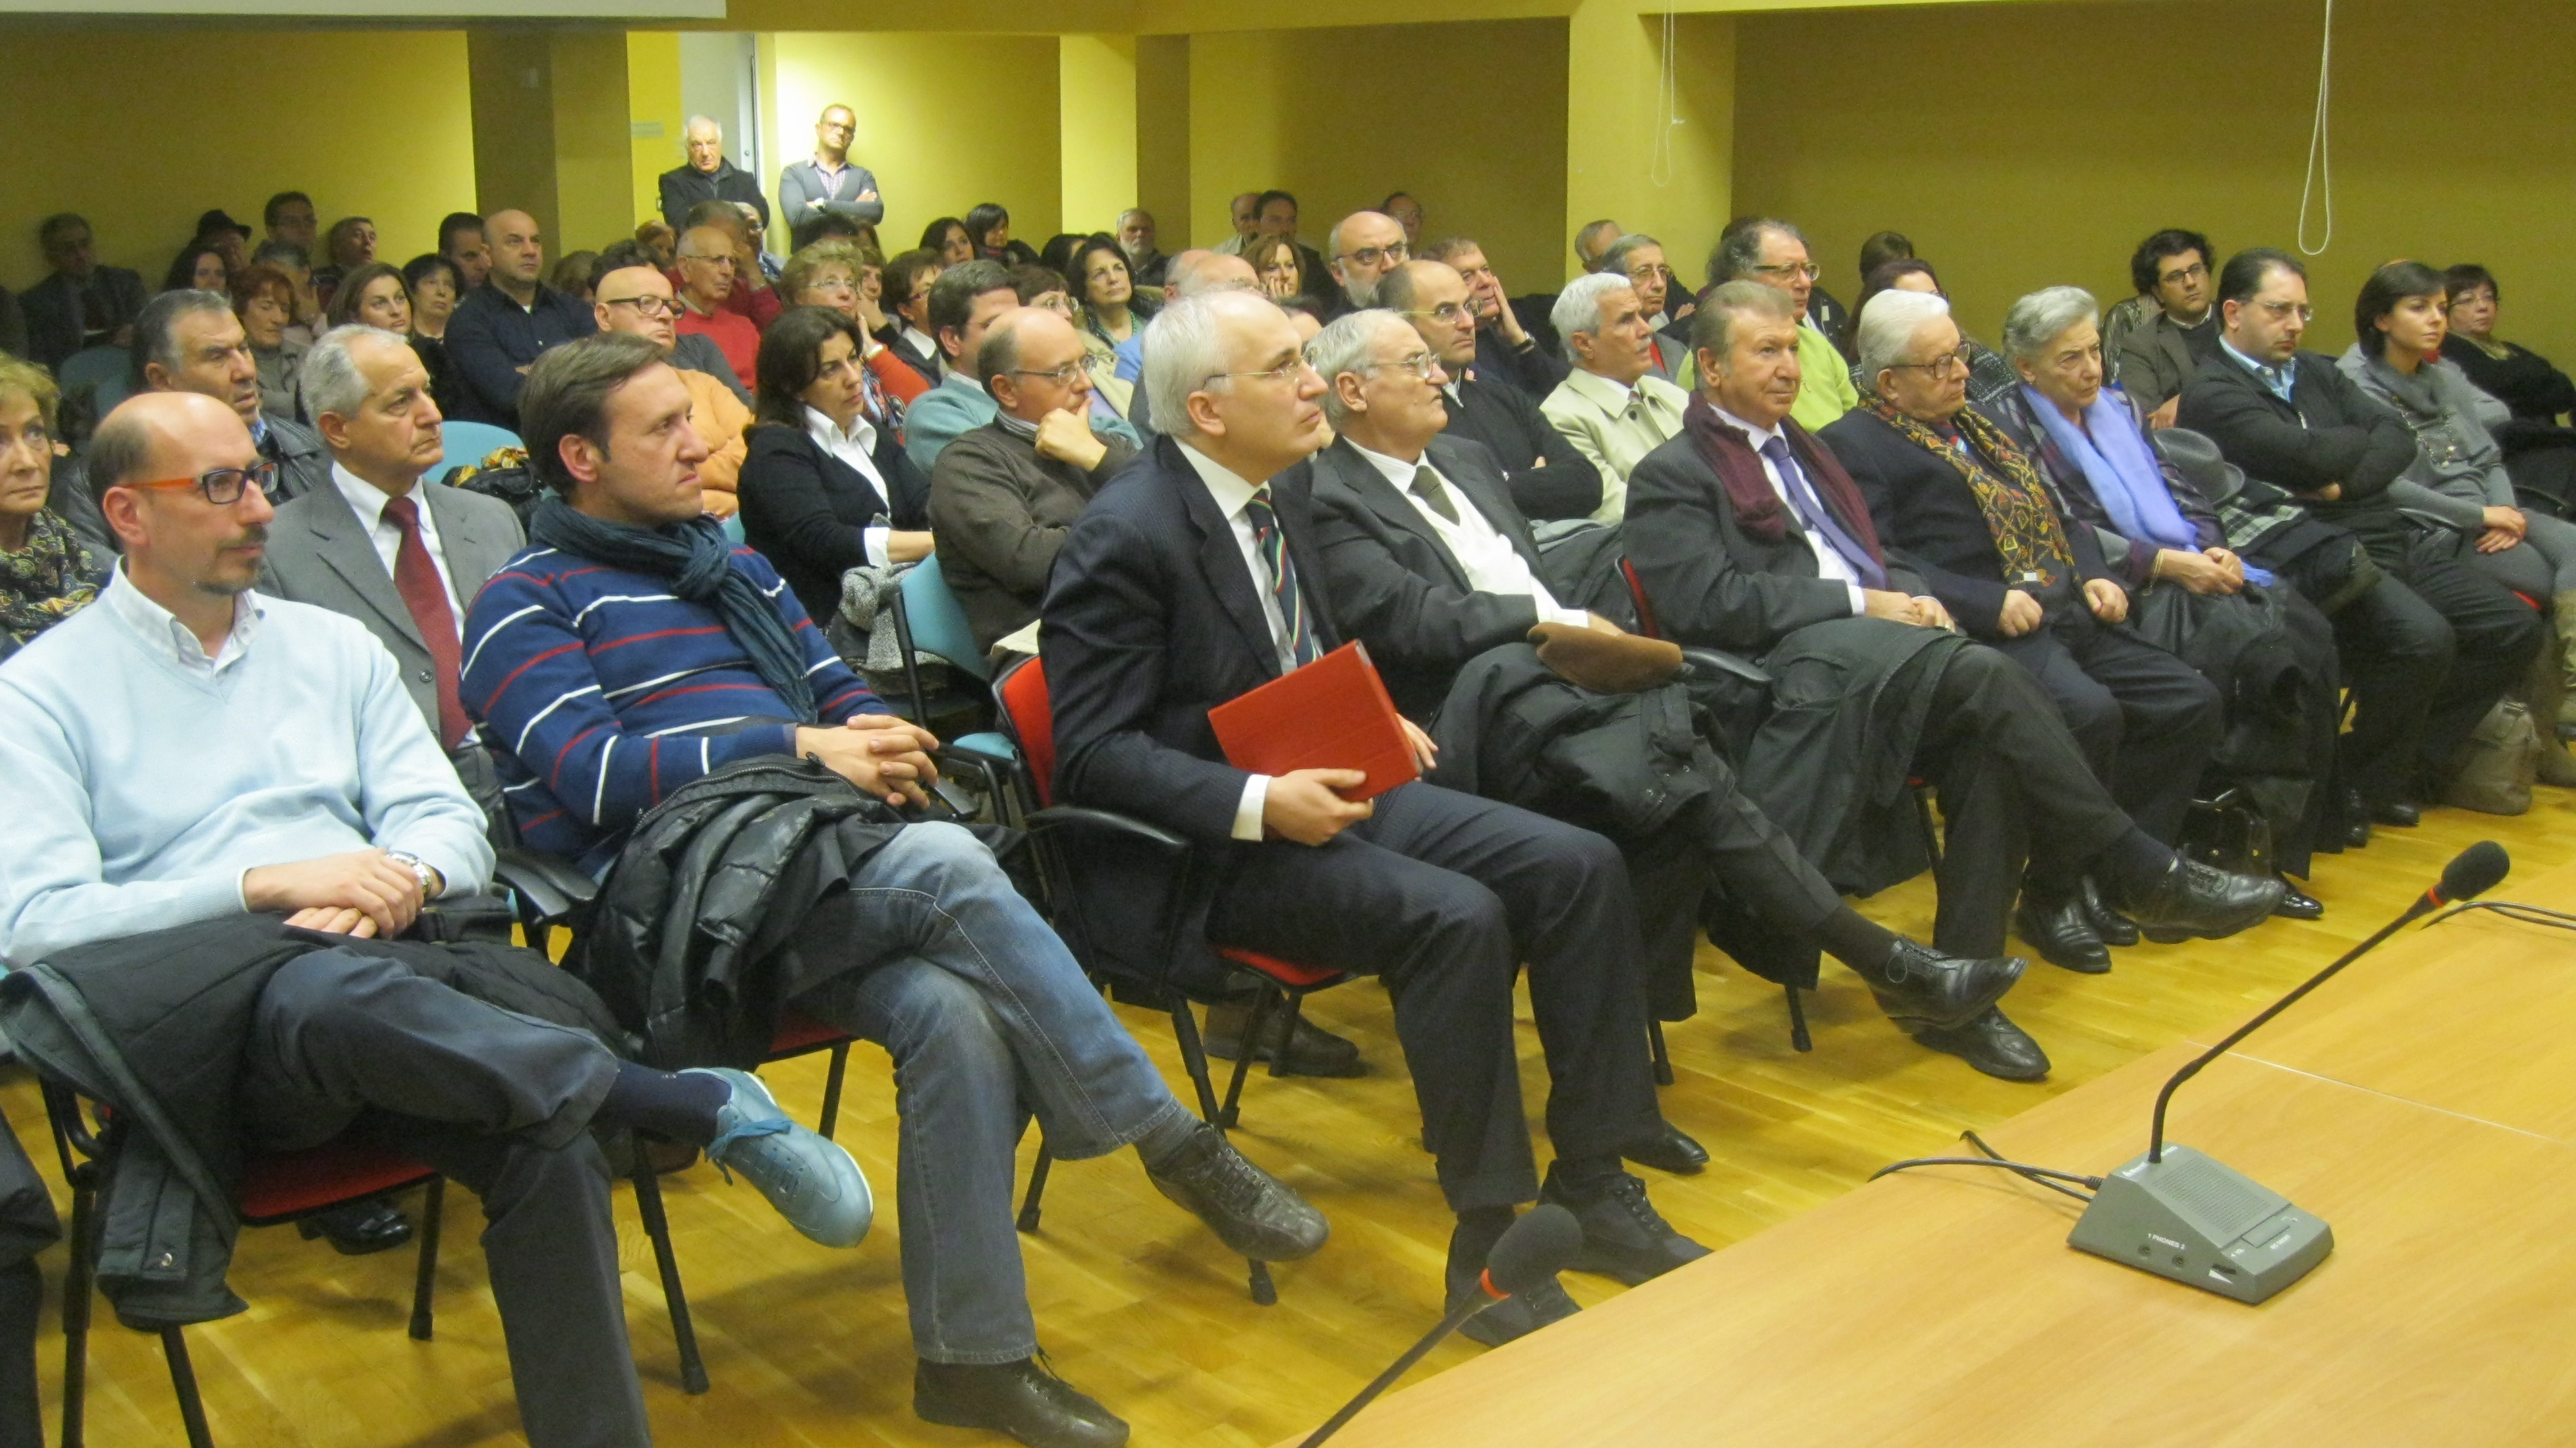 conferenza Nitti & Sturzo 012